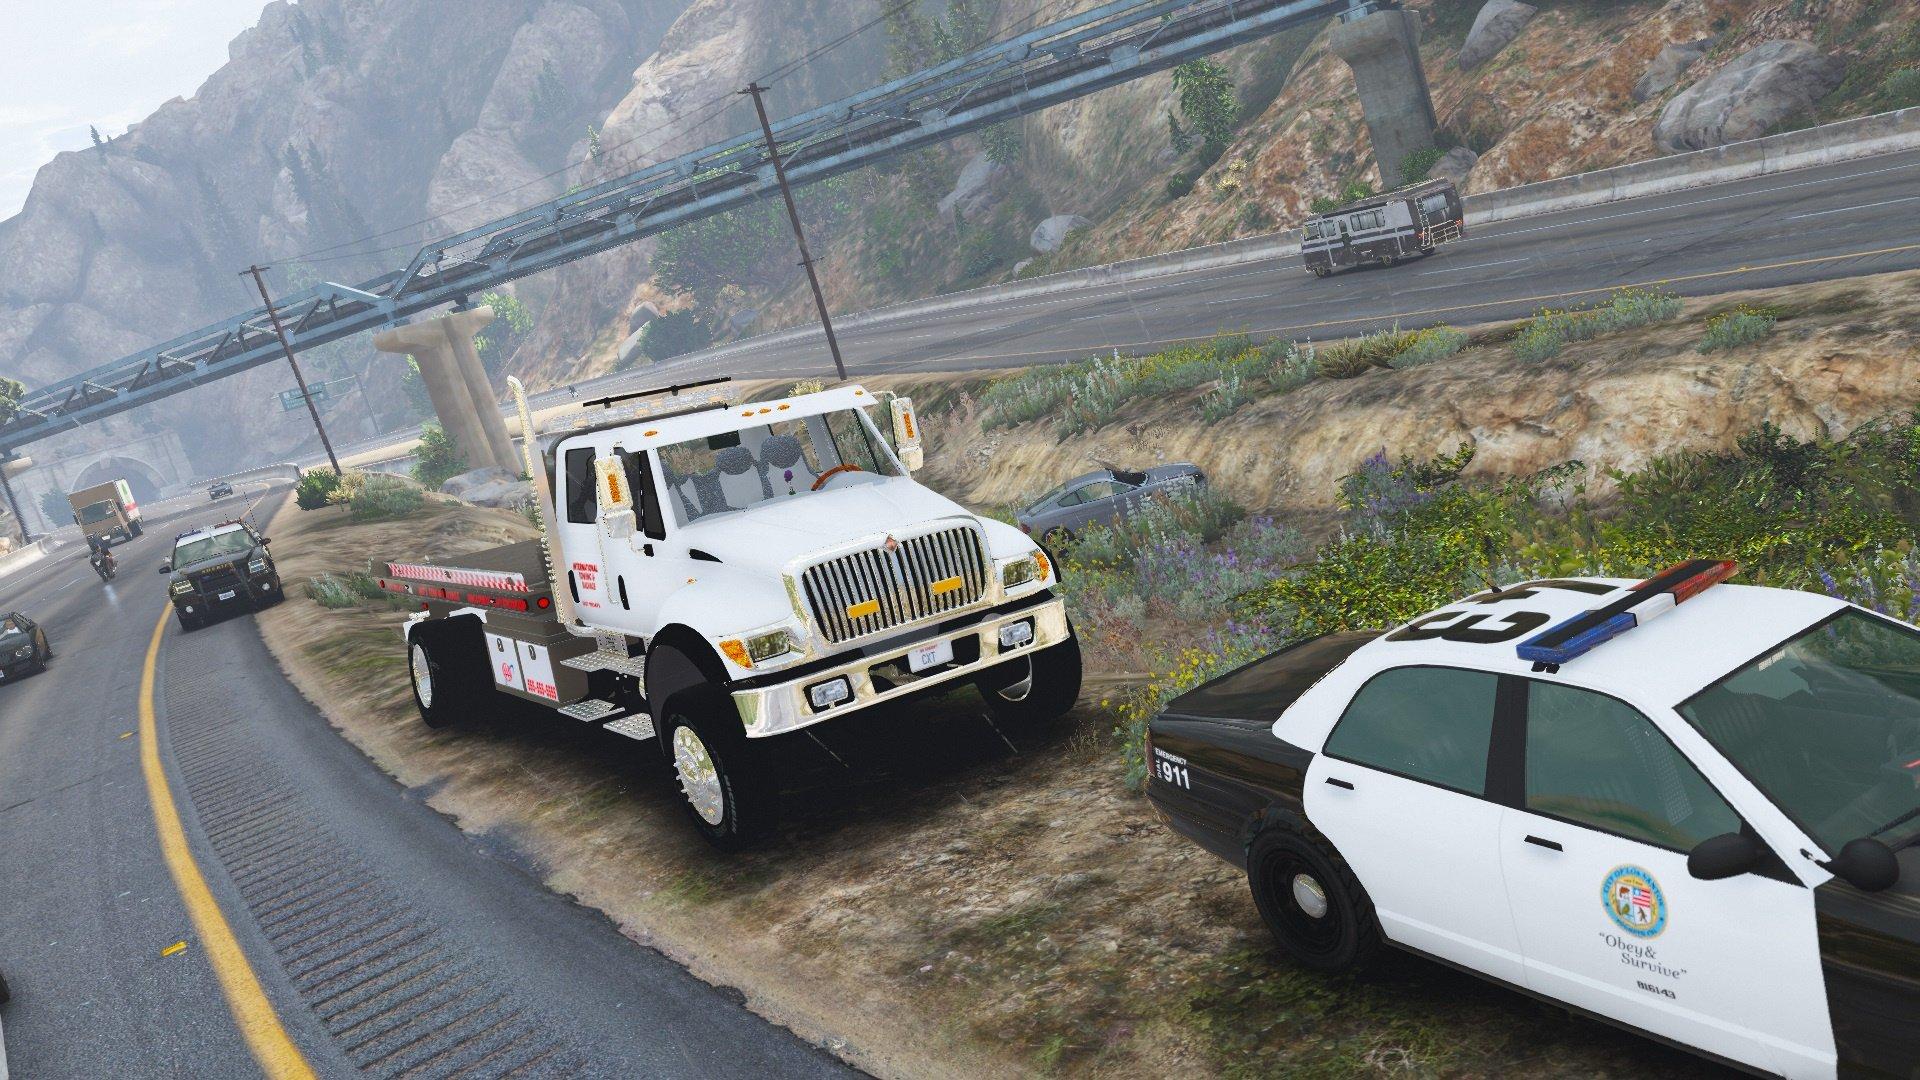 CXT flatbed tow truck [ELS] [Addon/Replace] - GTA5-Mods com